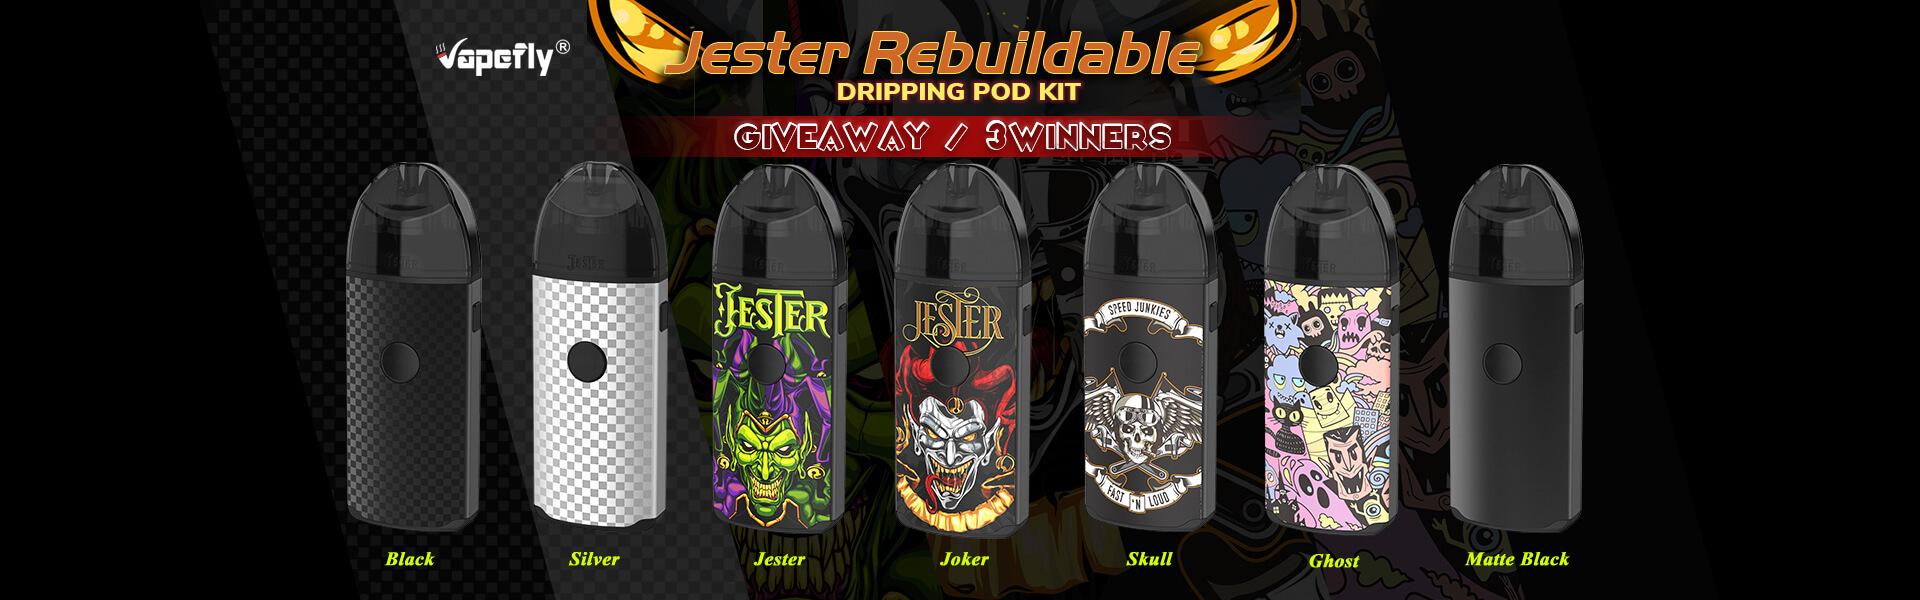 Vapefly-Jester-Rebuildable-Dripping-Pod-Kit